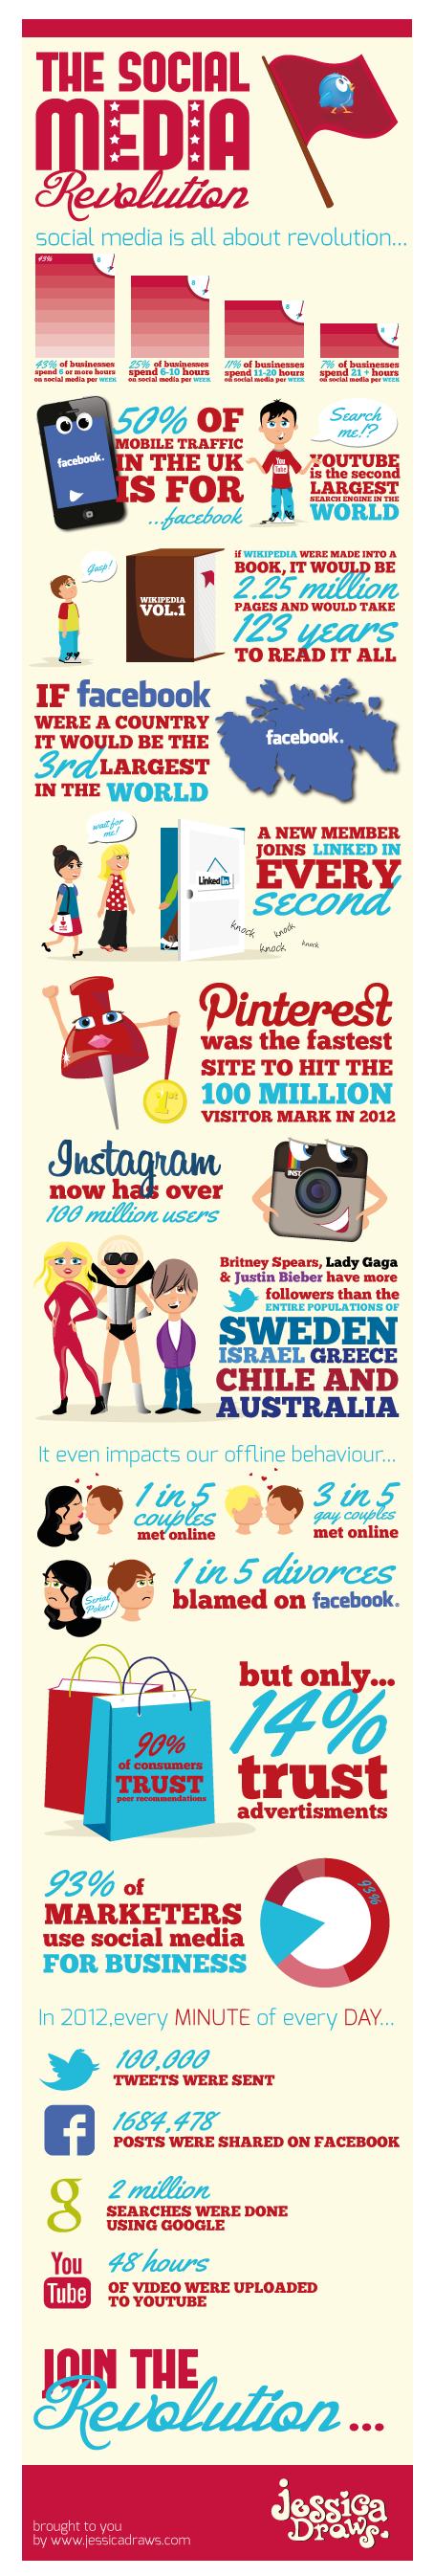 the social media revolution infographic